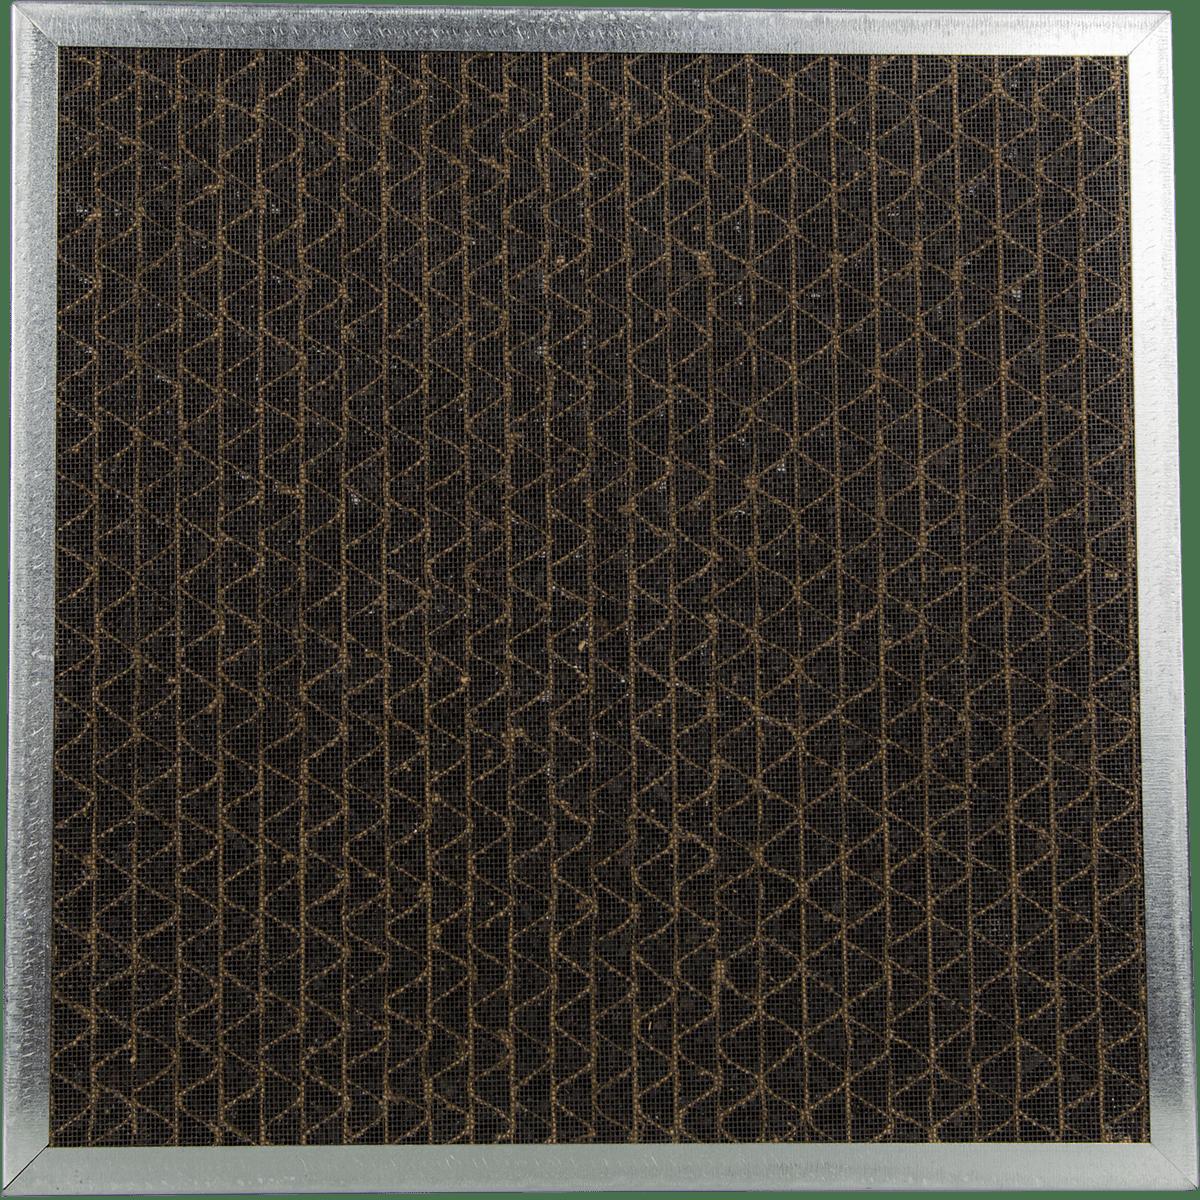 Phoenix Carbon Potassium Filter 7 5 Lbs Sylvane